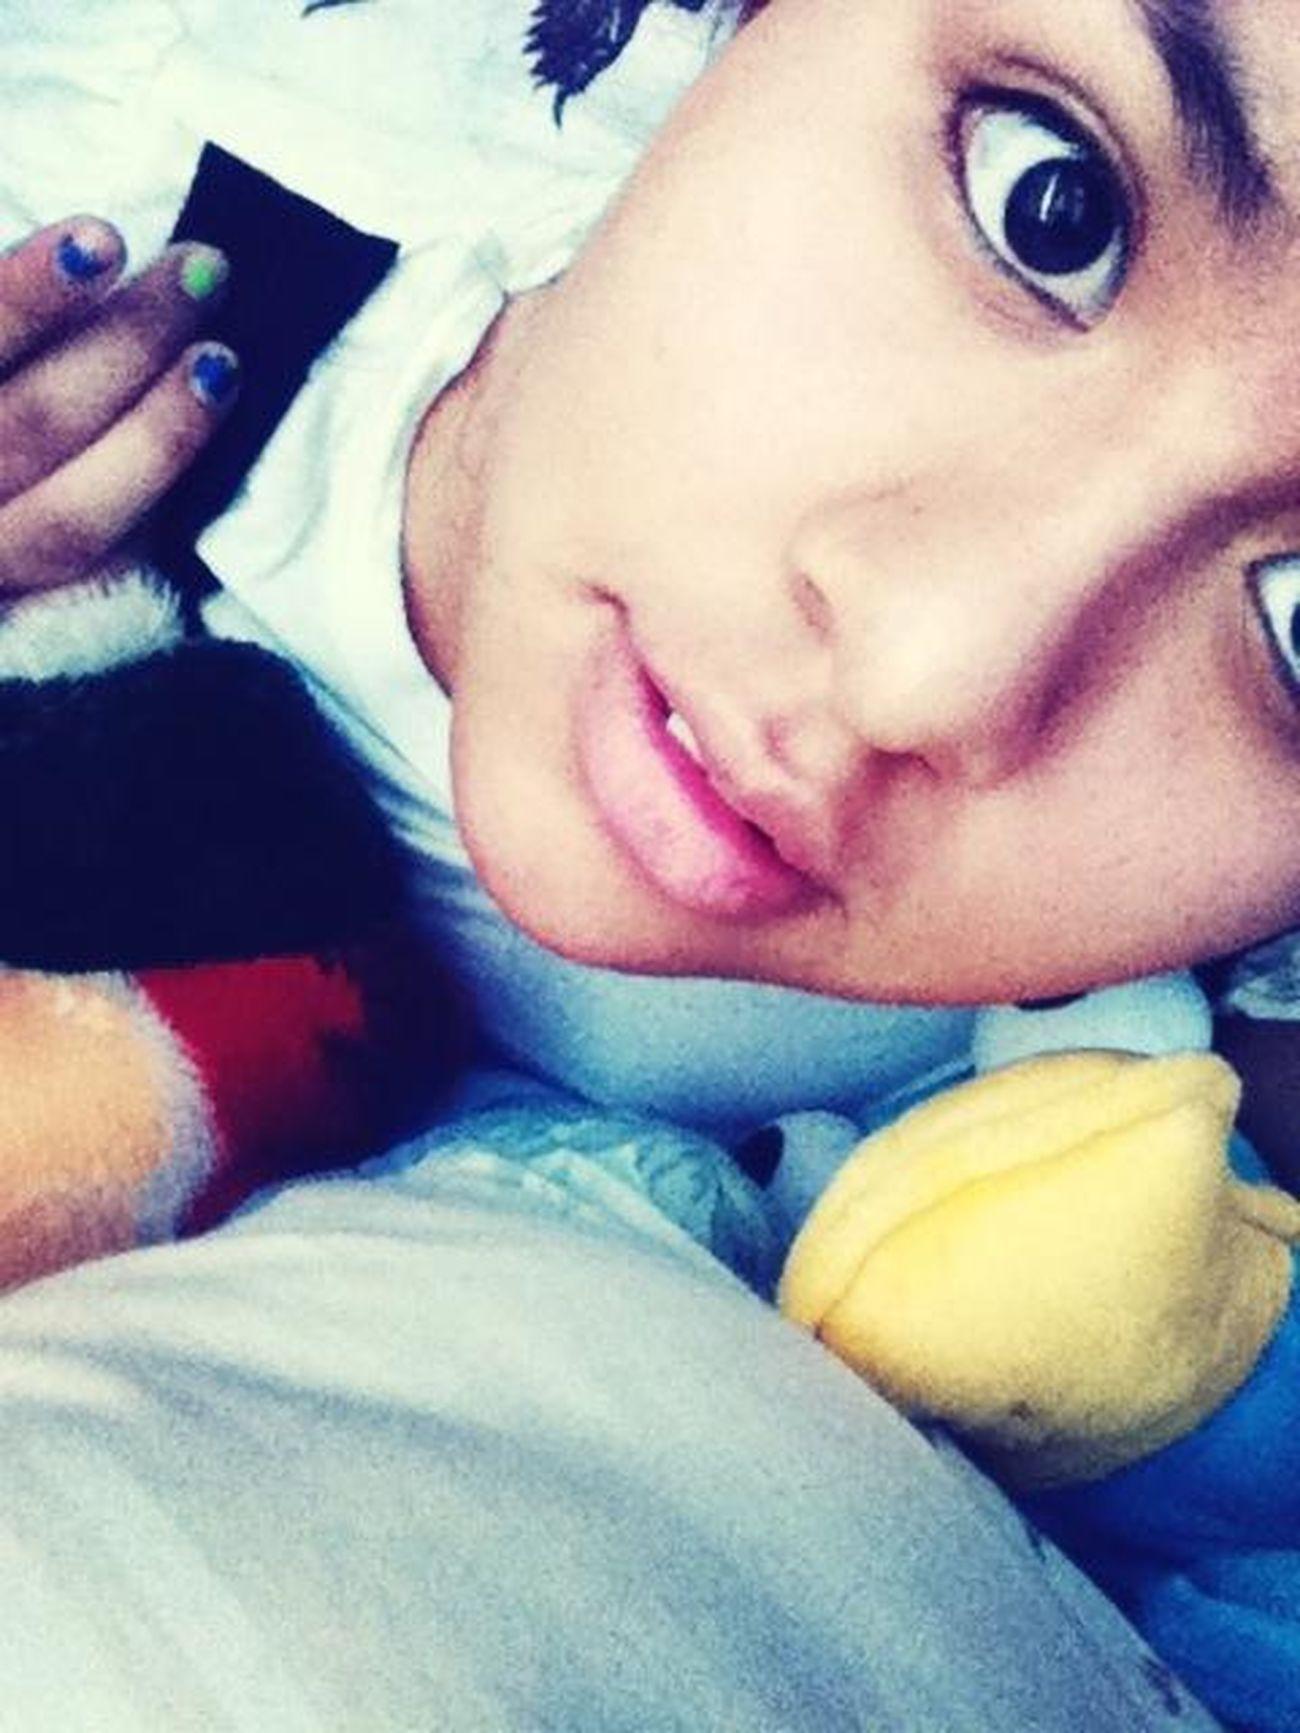 Must Admit Im Bored >_<